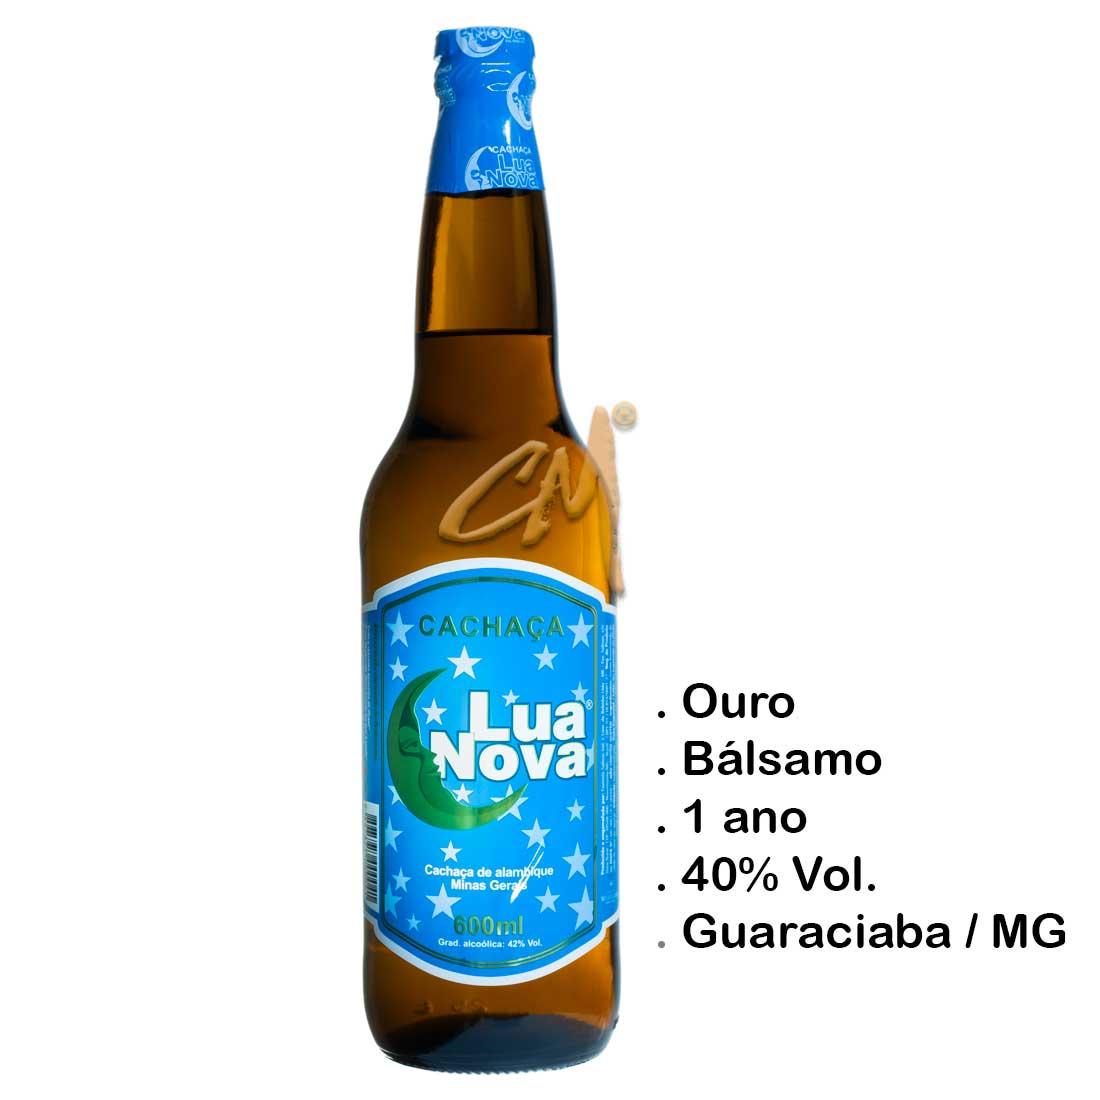 Cachaça Lua Nova 600 ml (Salinas - MG)